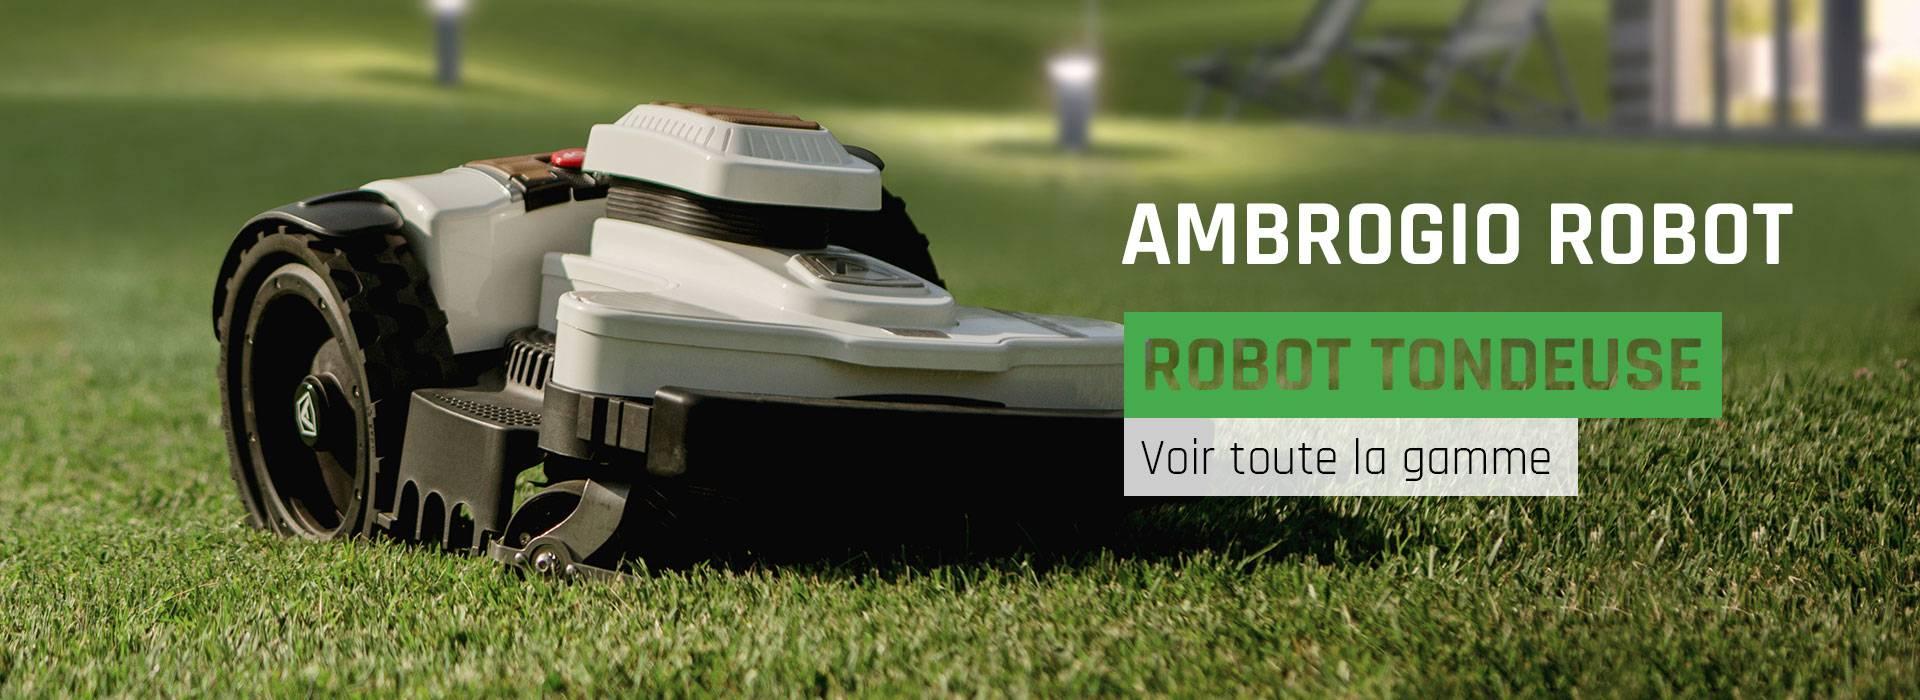 Robot automatique Ambrogio